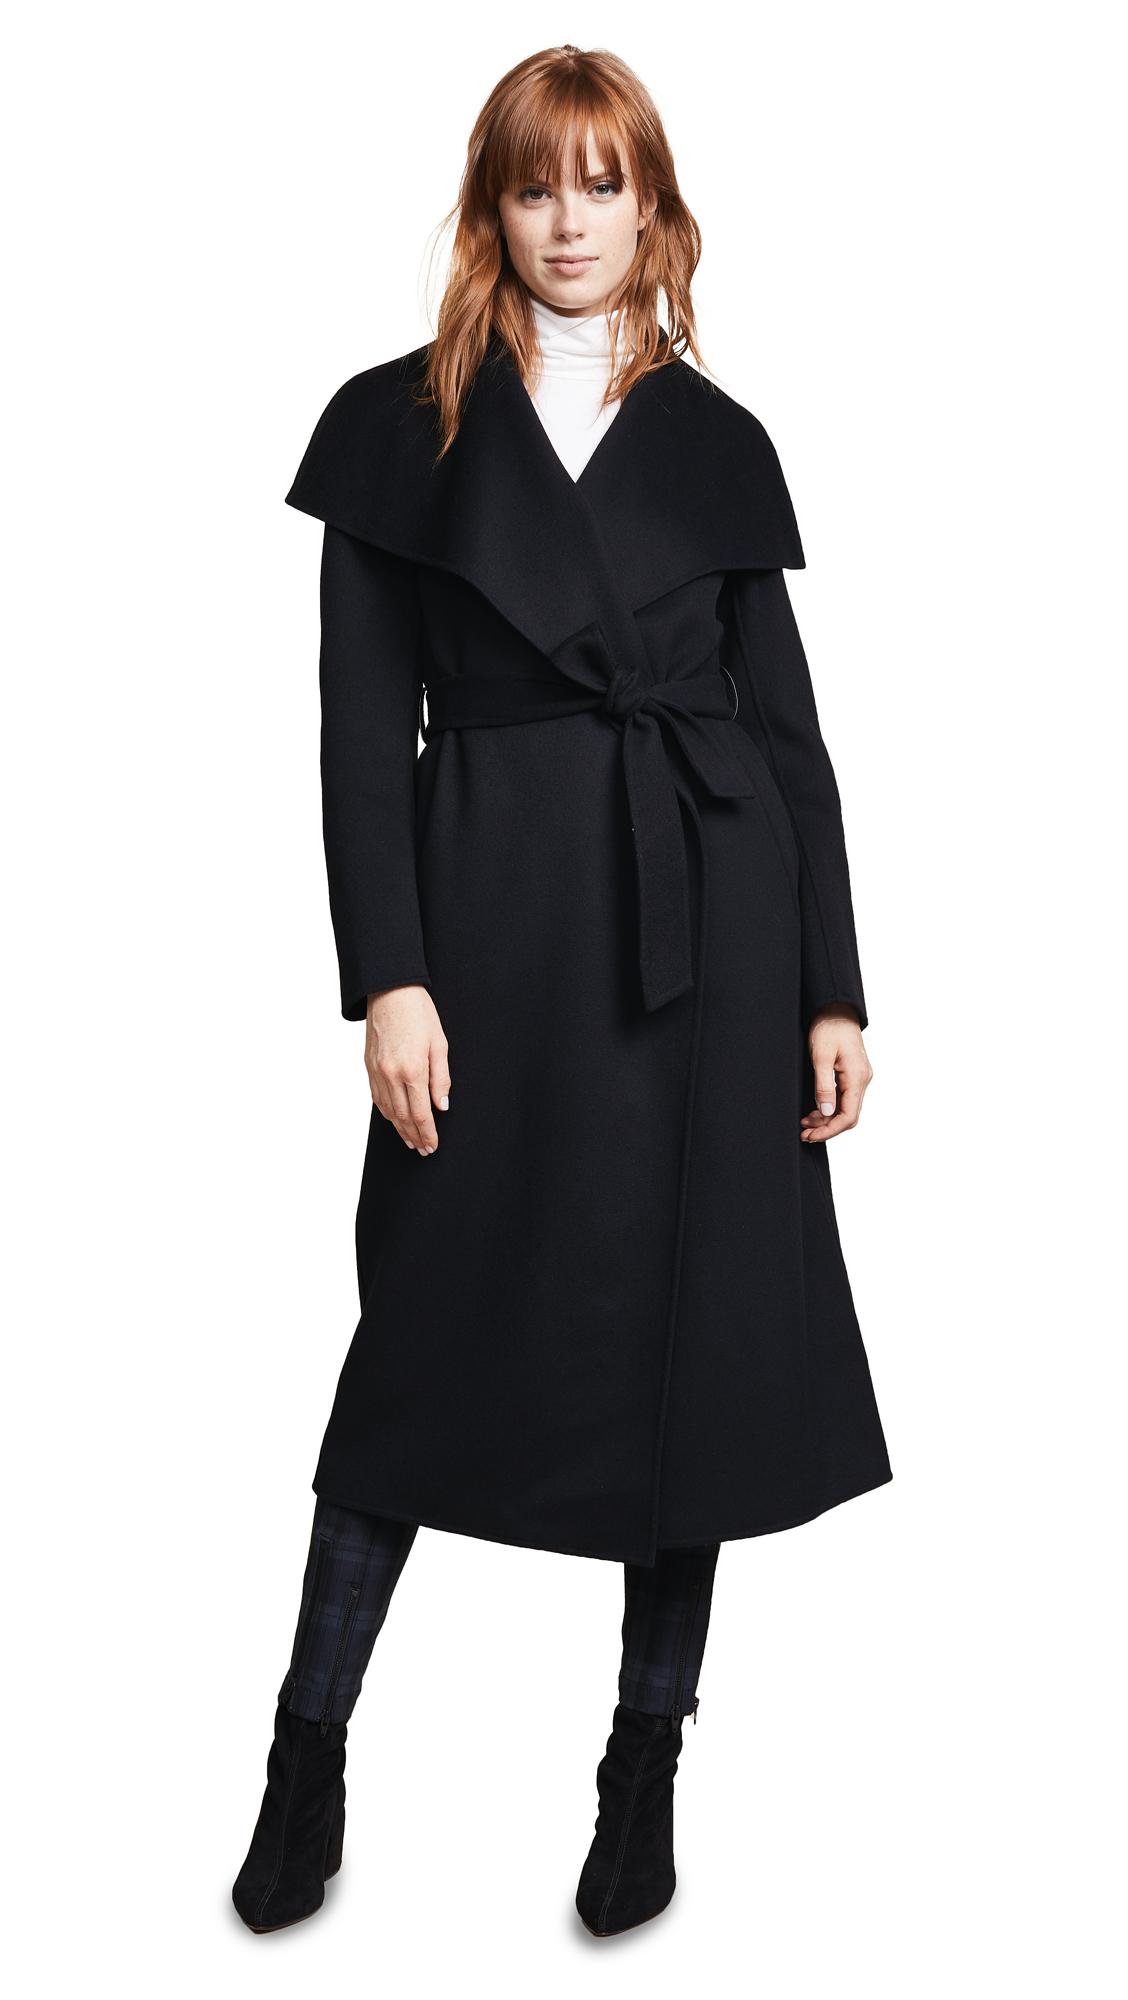 Mackage Mai Wool Jacket - Black